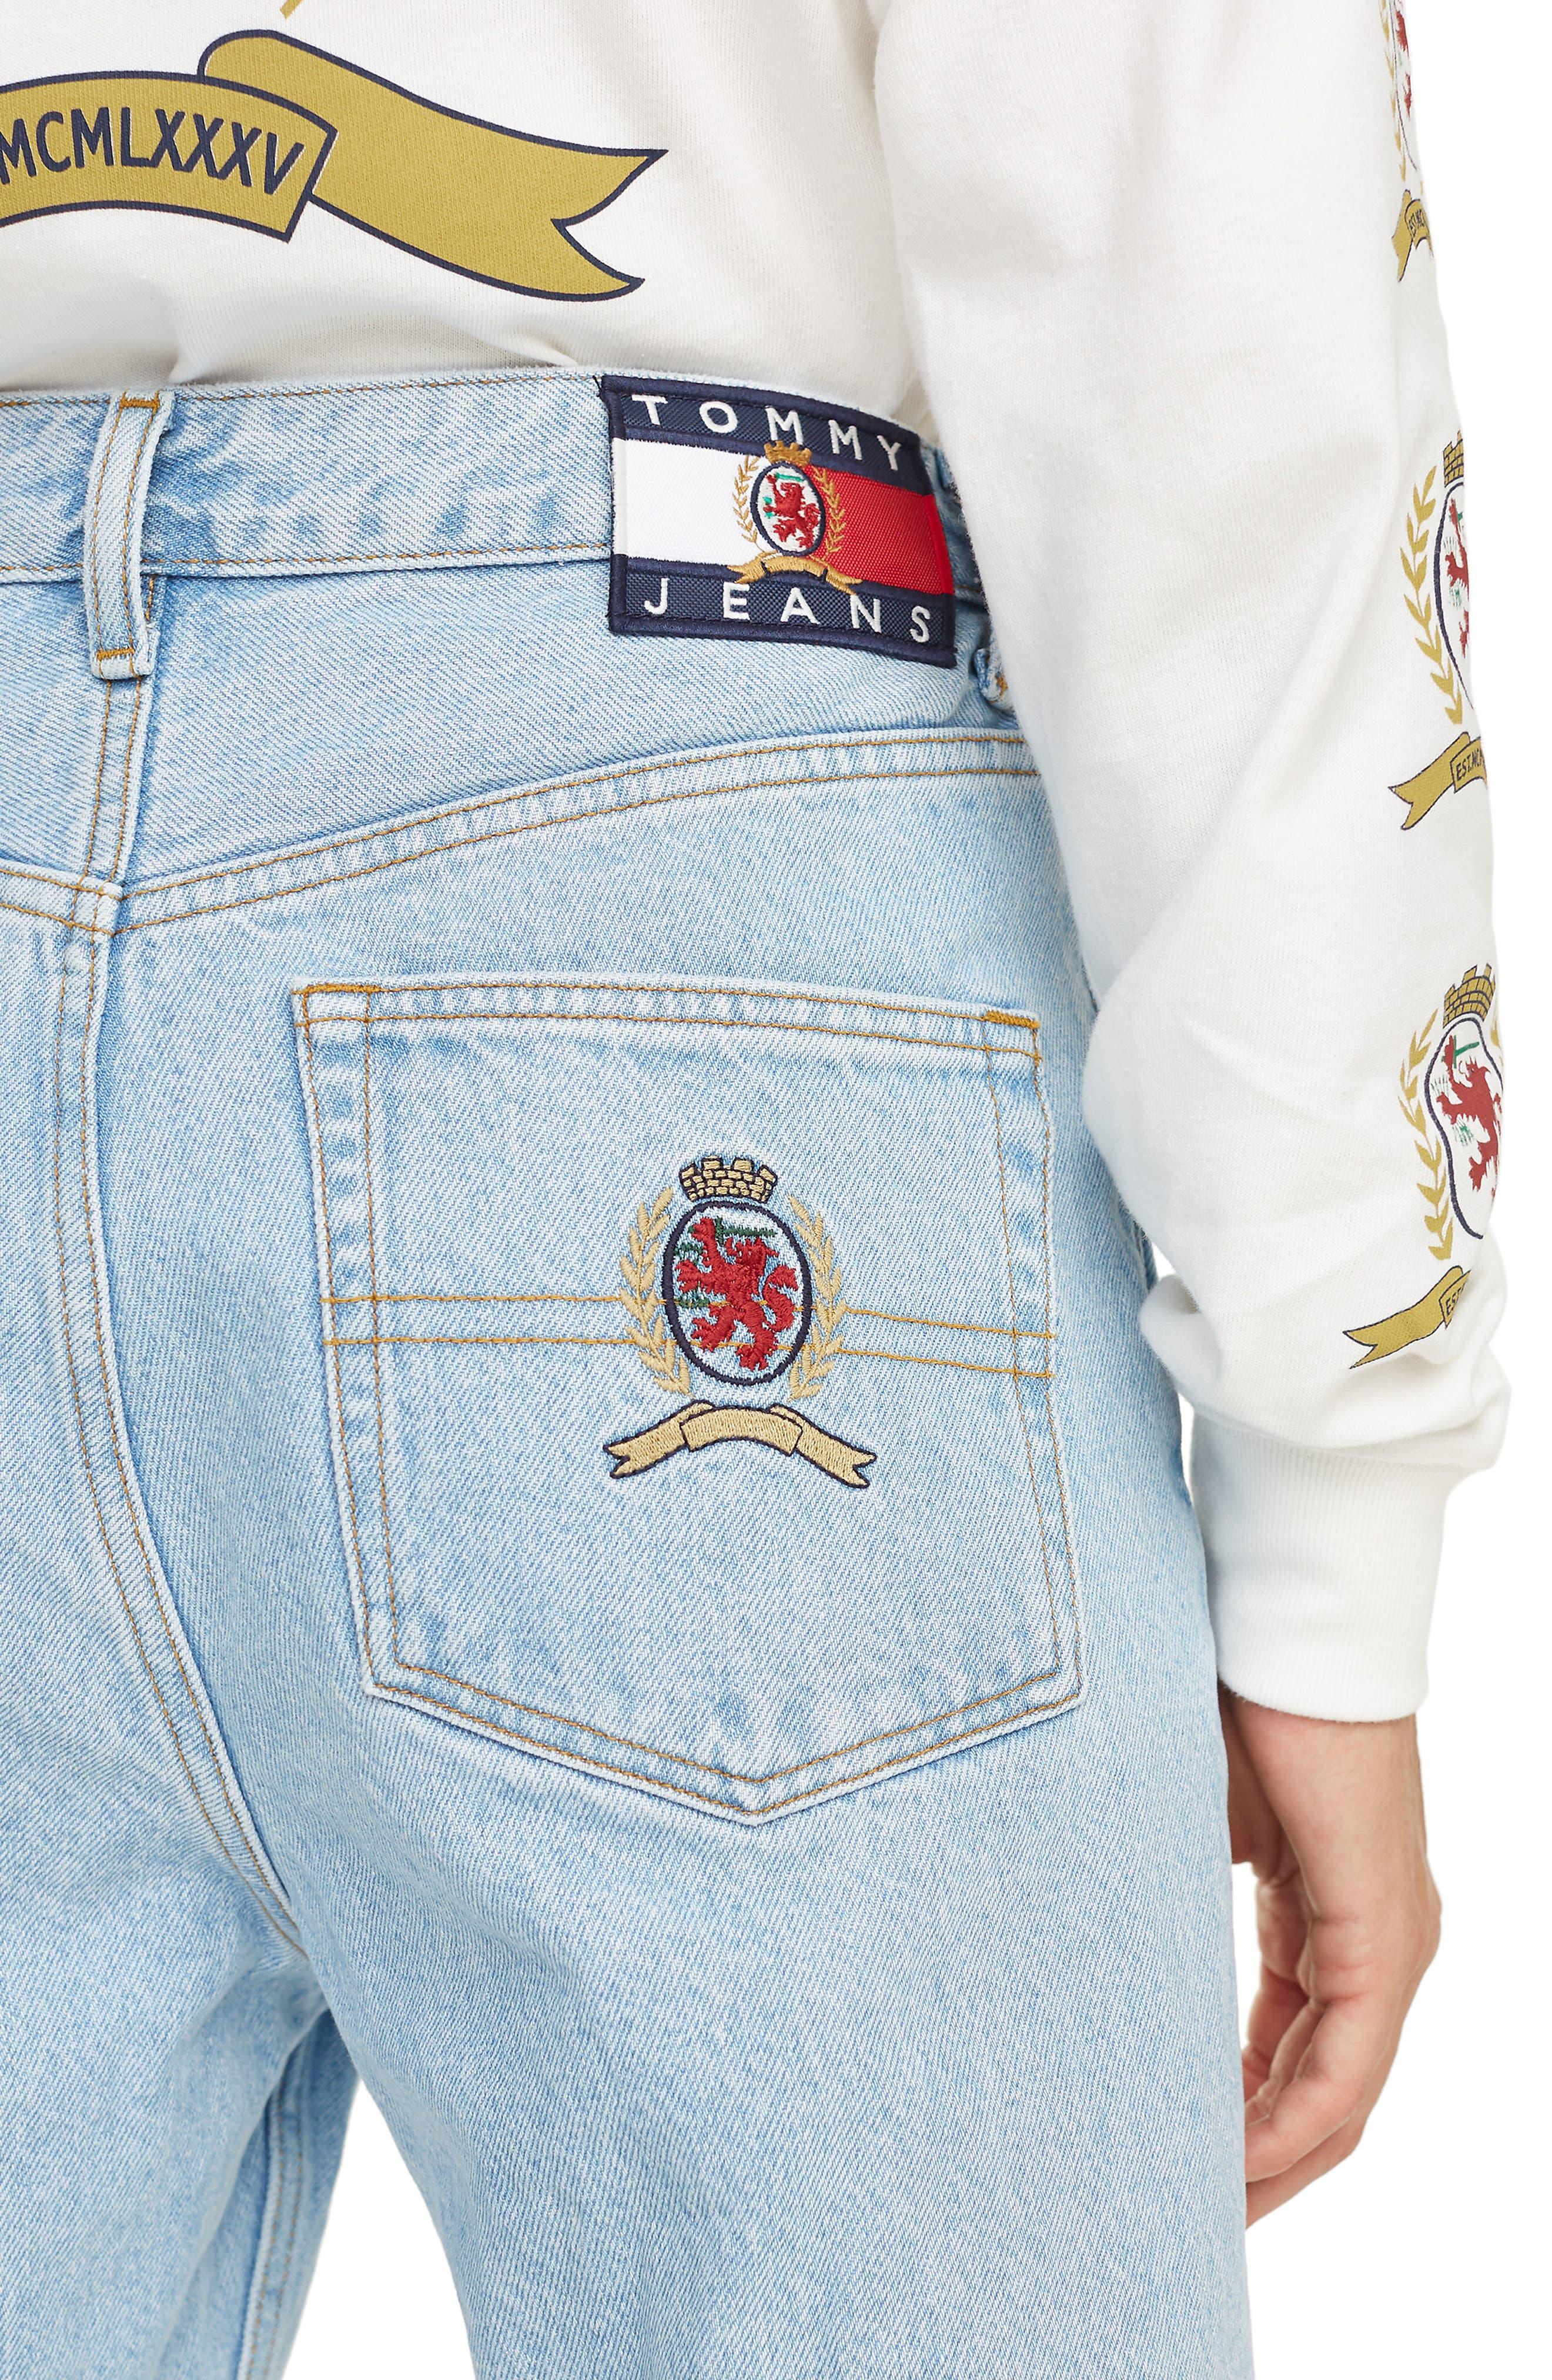 Crest Capsule Mom Jeans,                             Alternate thumbnail 3, color,                             LIGHT BLUE DENIM